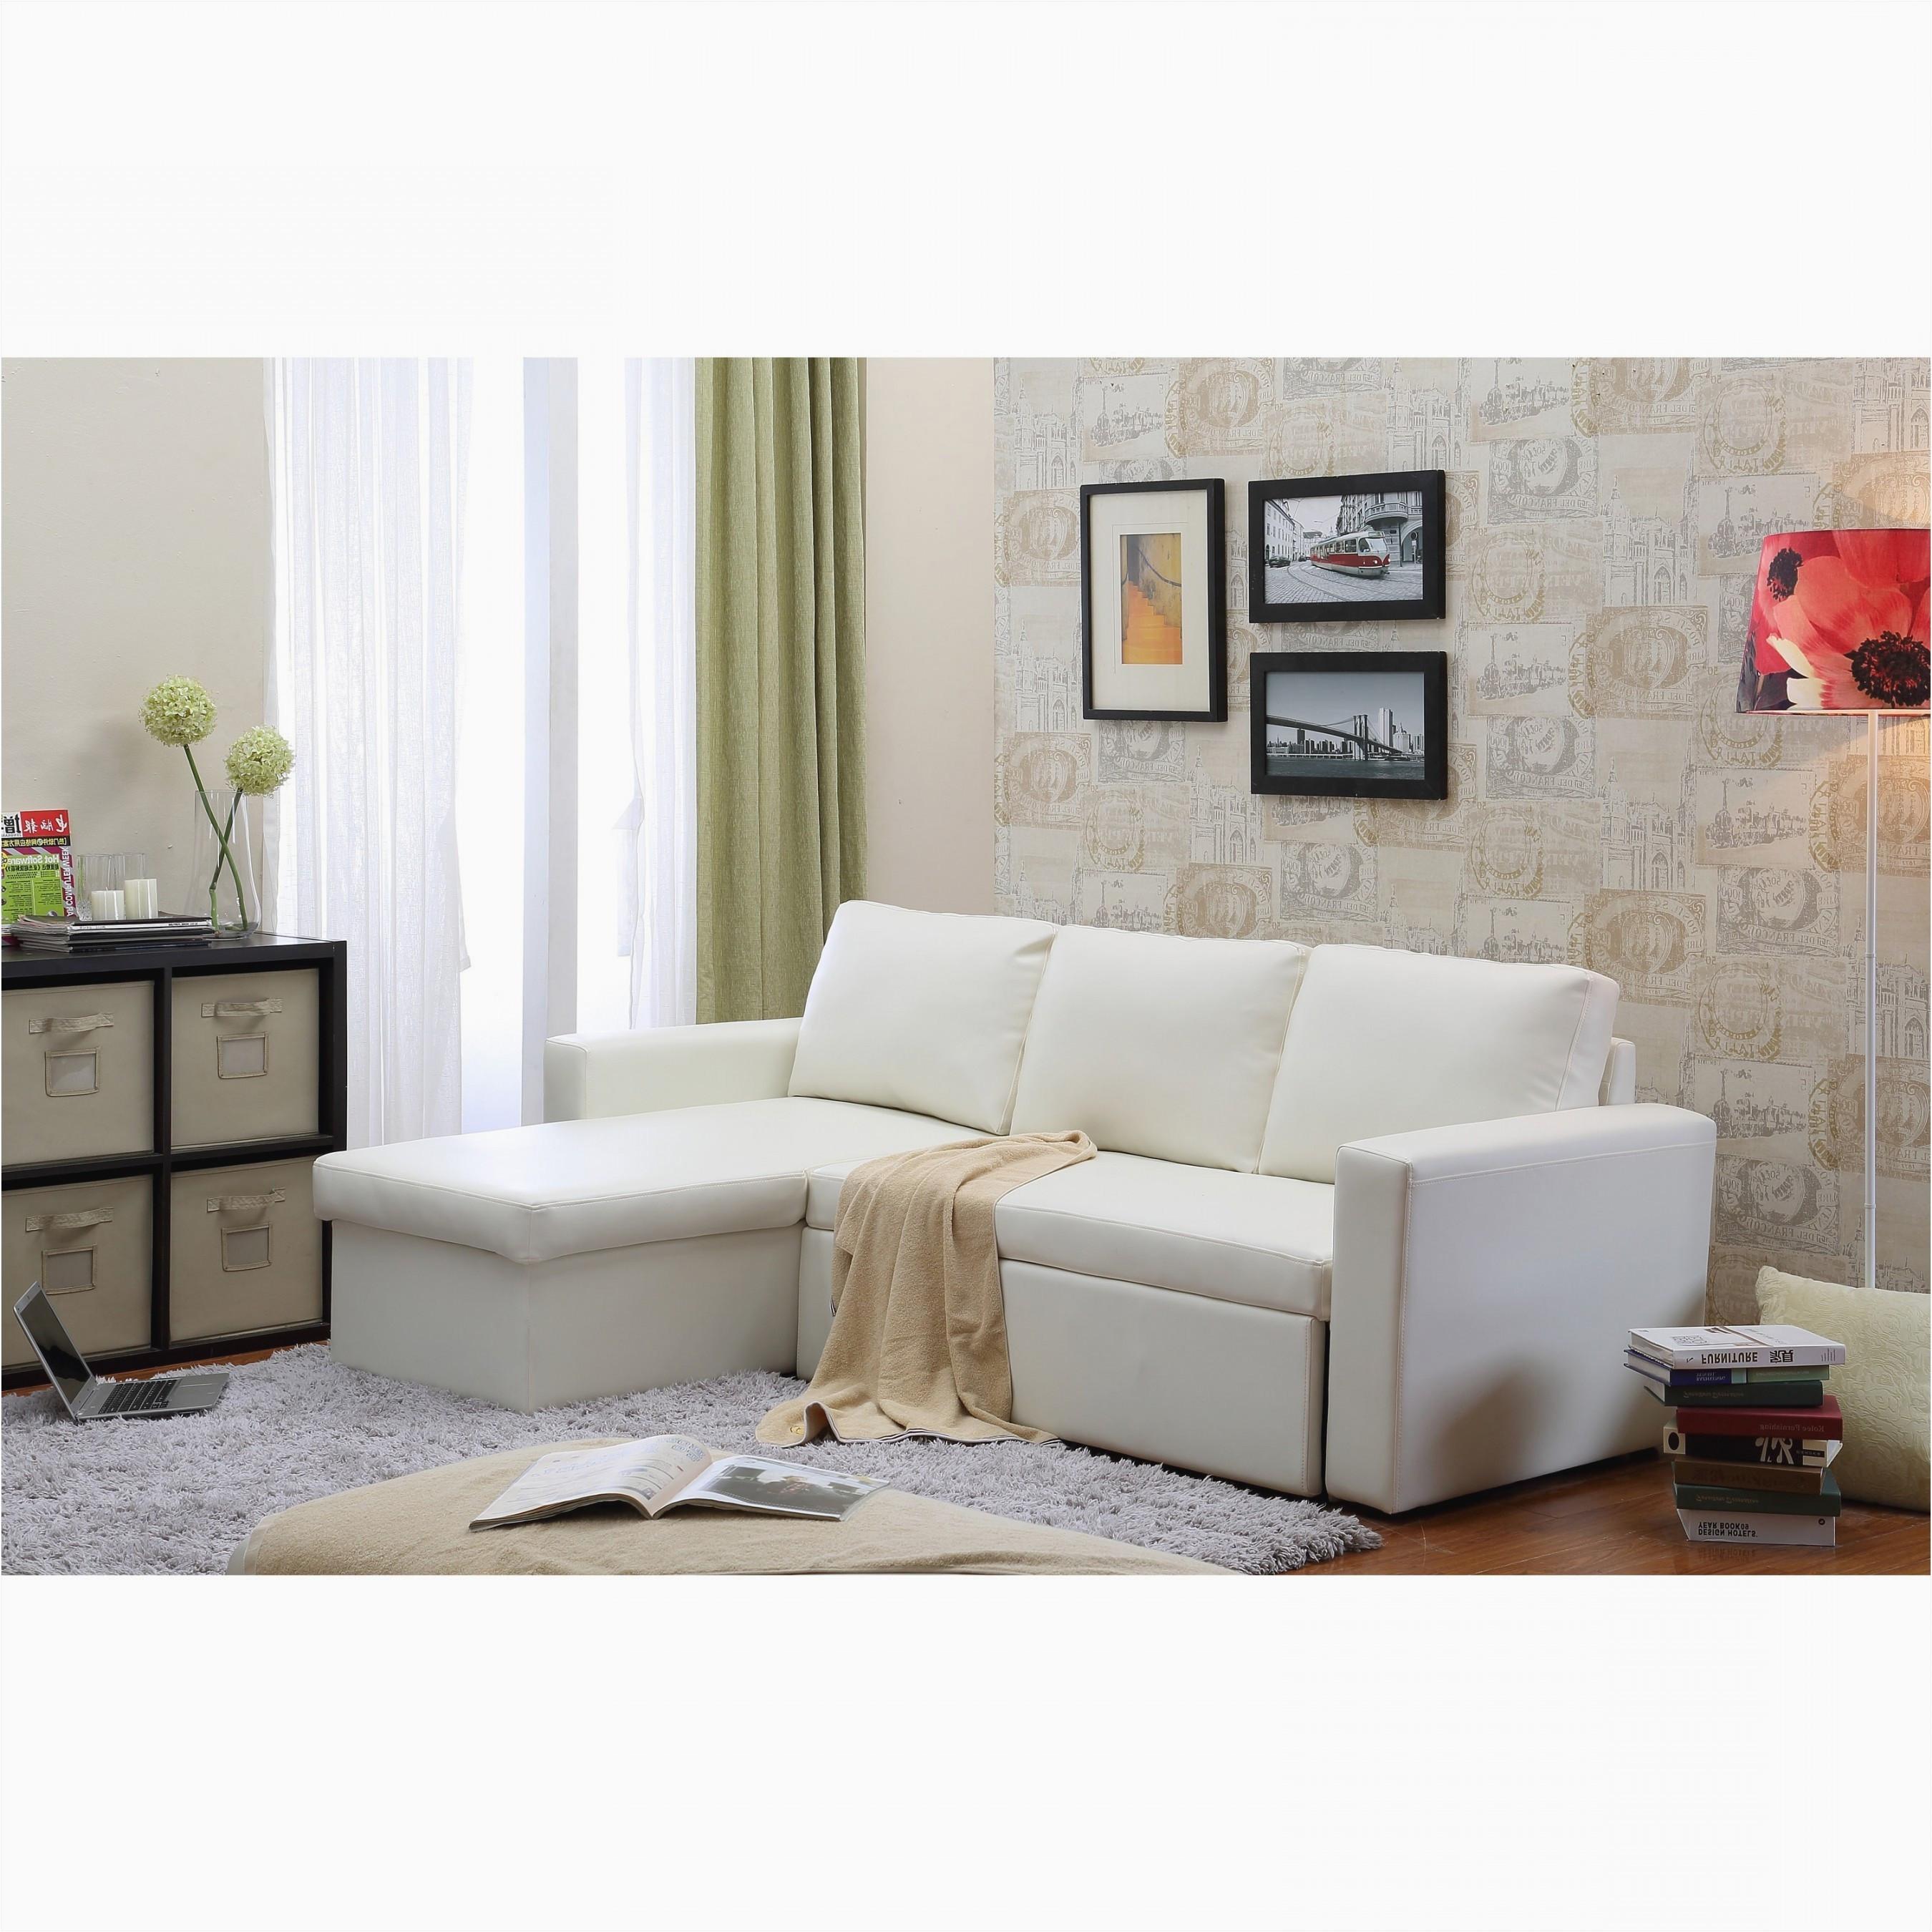 kohl s living room furniture awesome kohl s memory foam mattress incredible sofa upholstery 0d